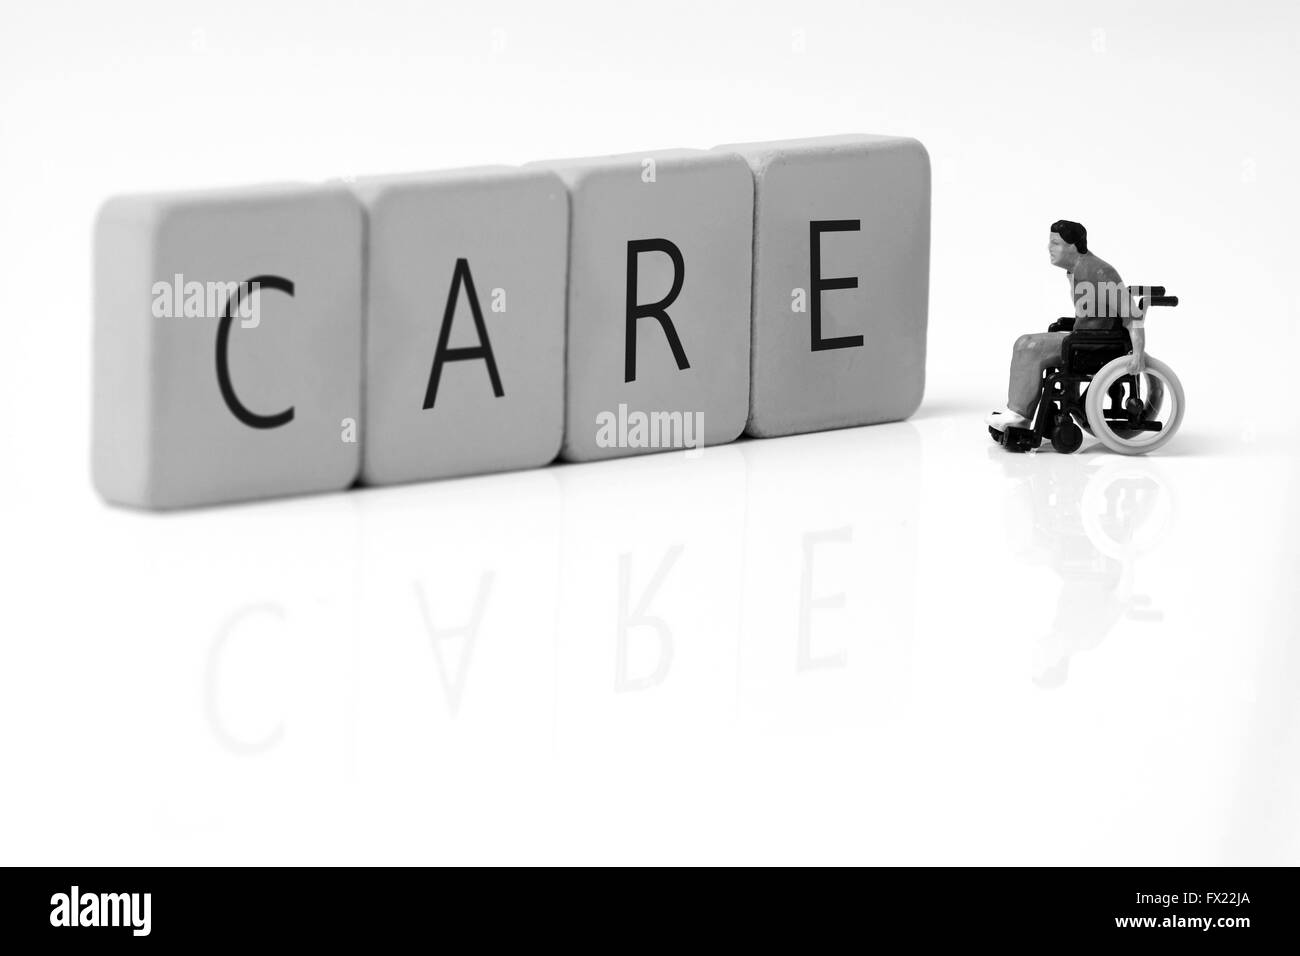 Miniature model man wheelchair tiles care - Stock Image